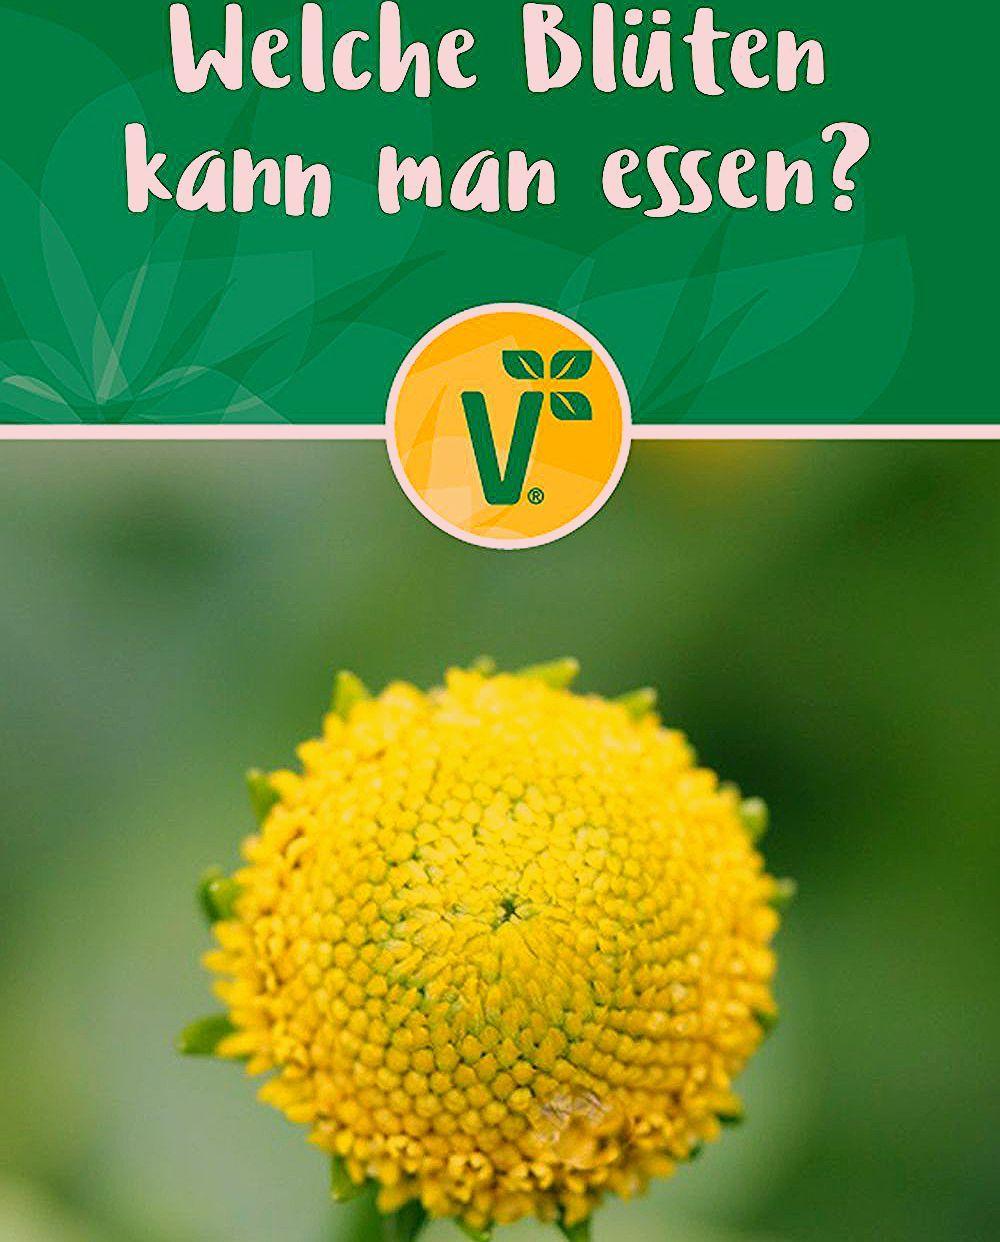 Photo of Kräuterpflanzen: Welche Blüten  kann man essen?